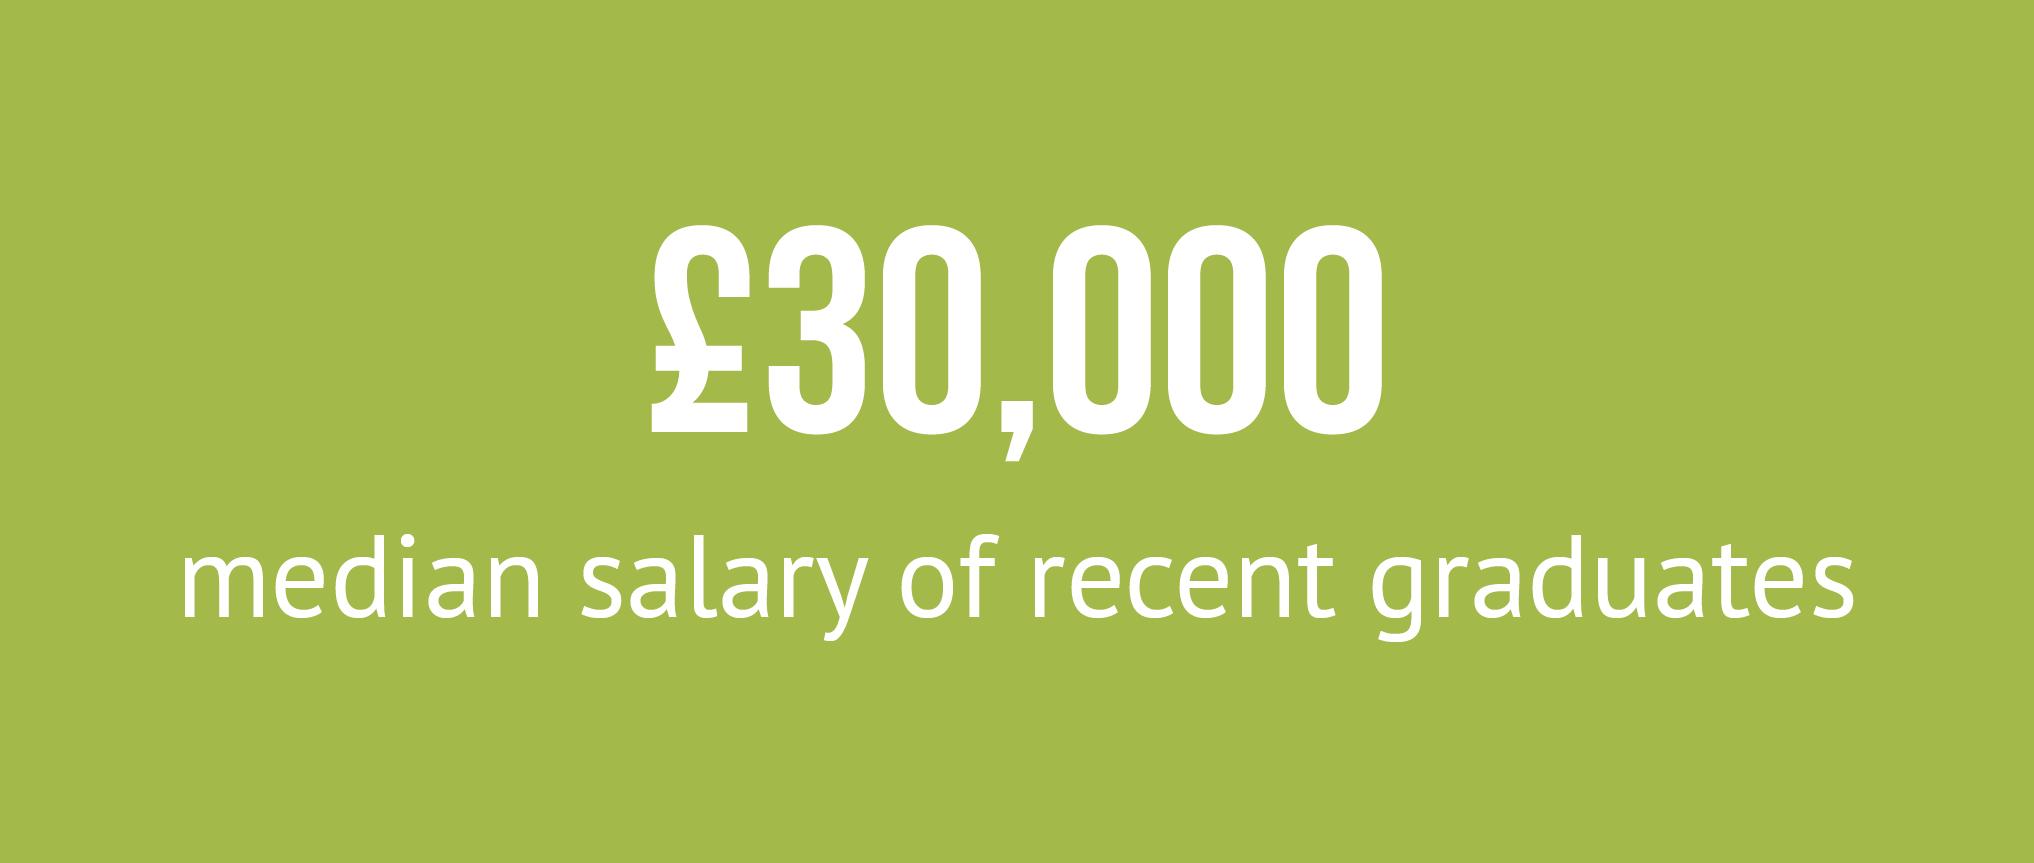 £30,000 median salary of recent graduates